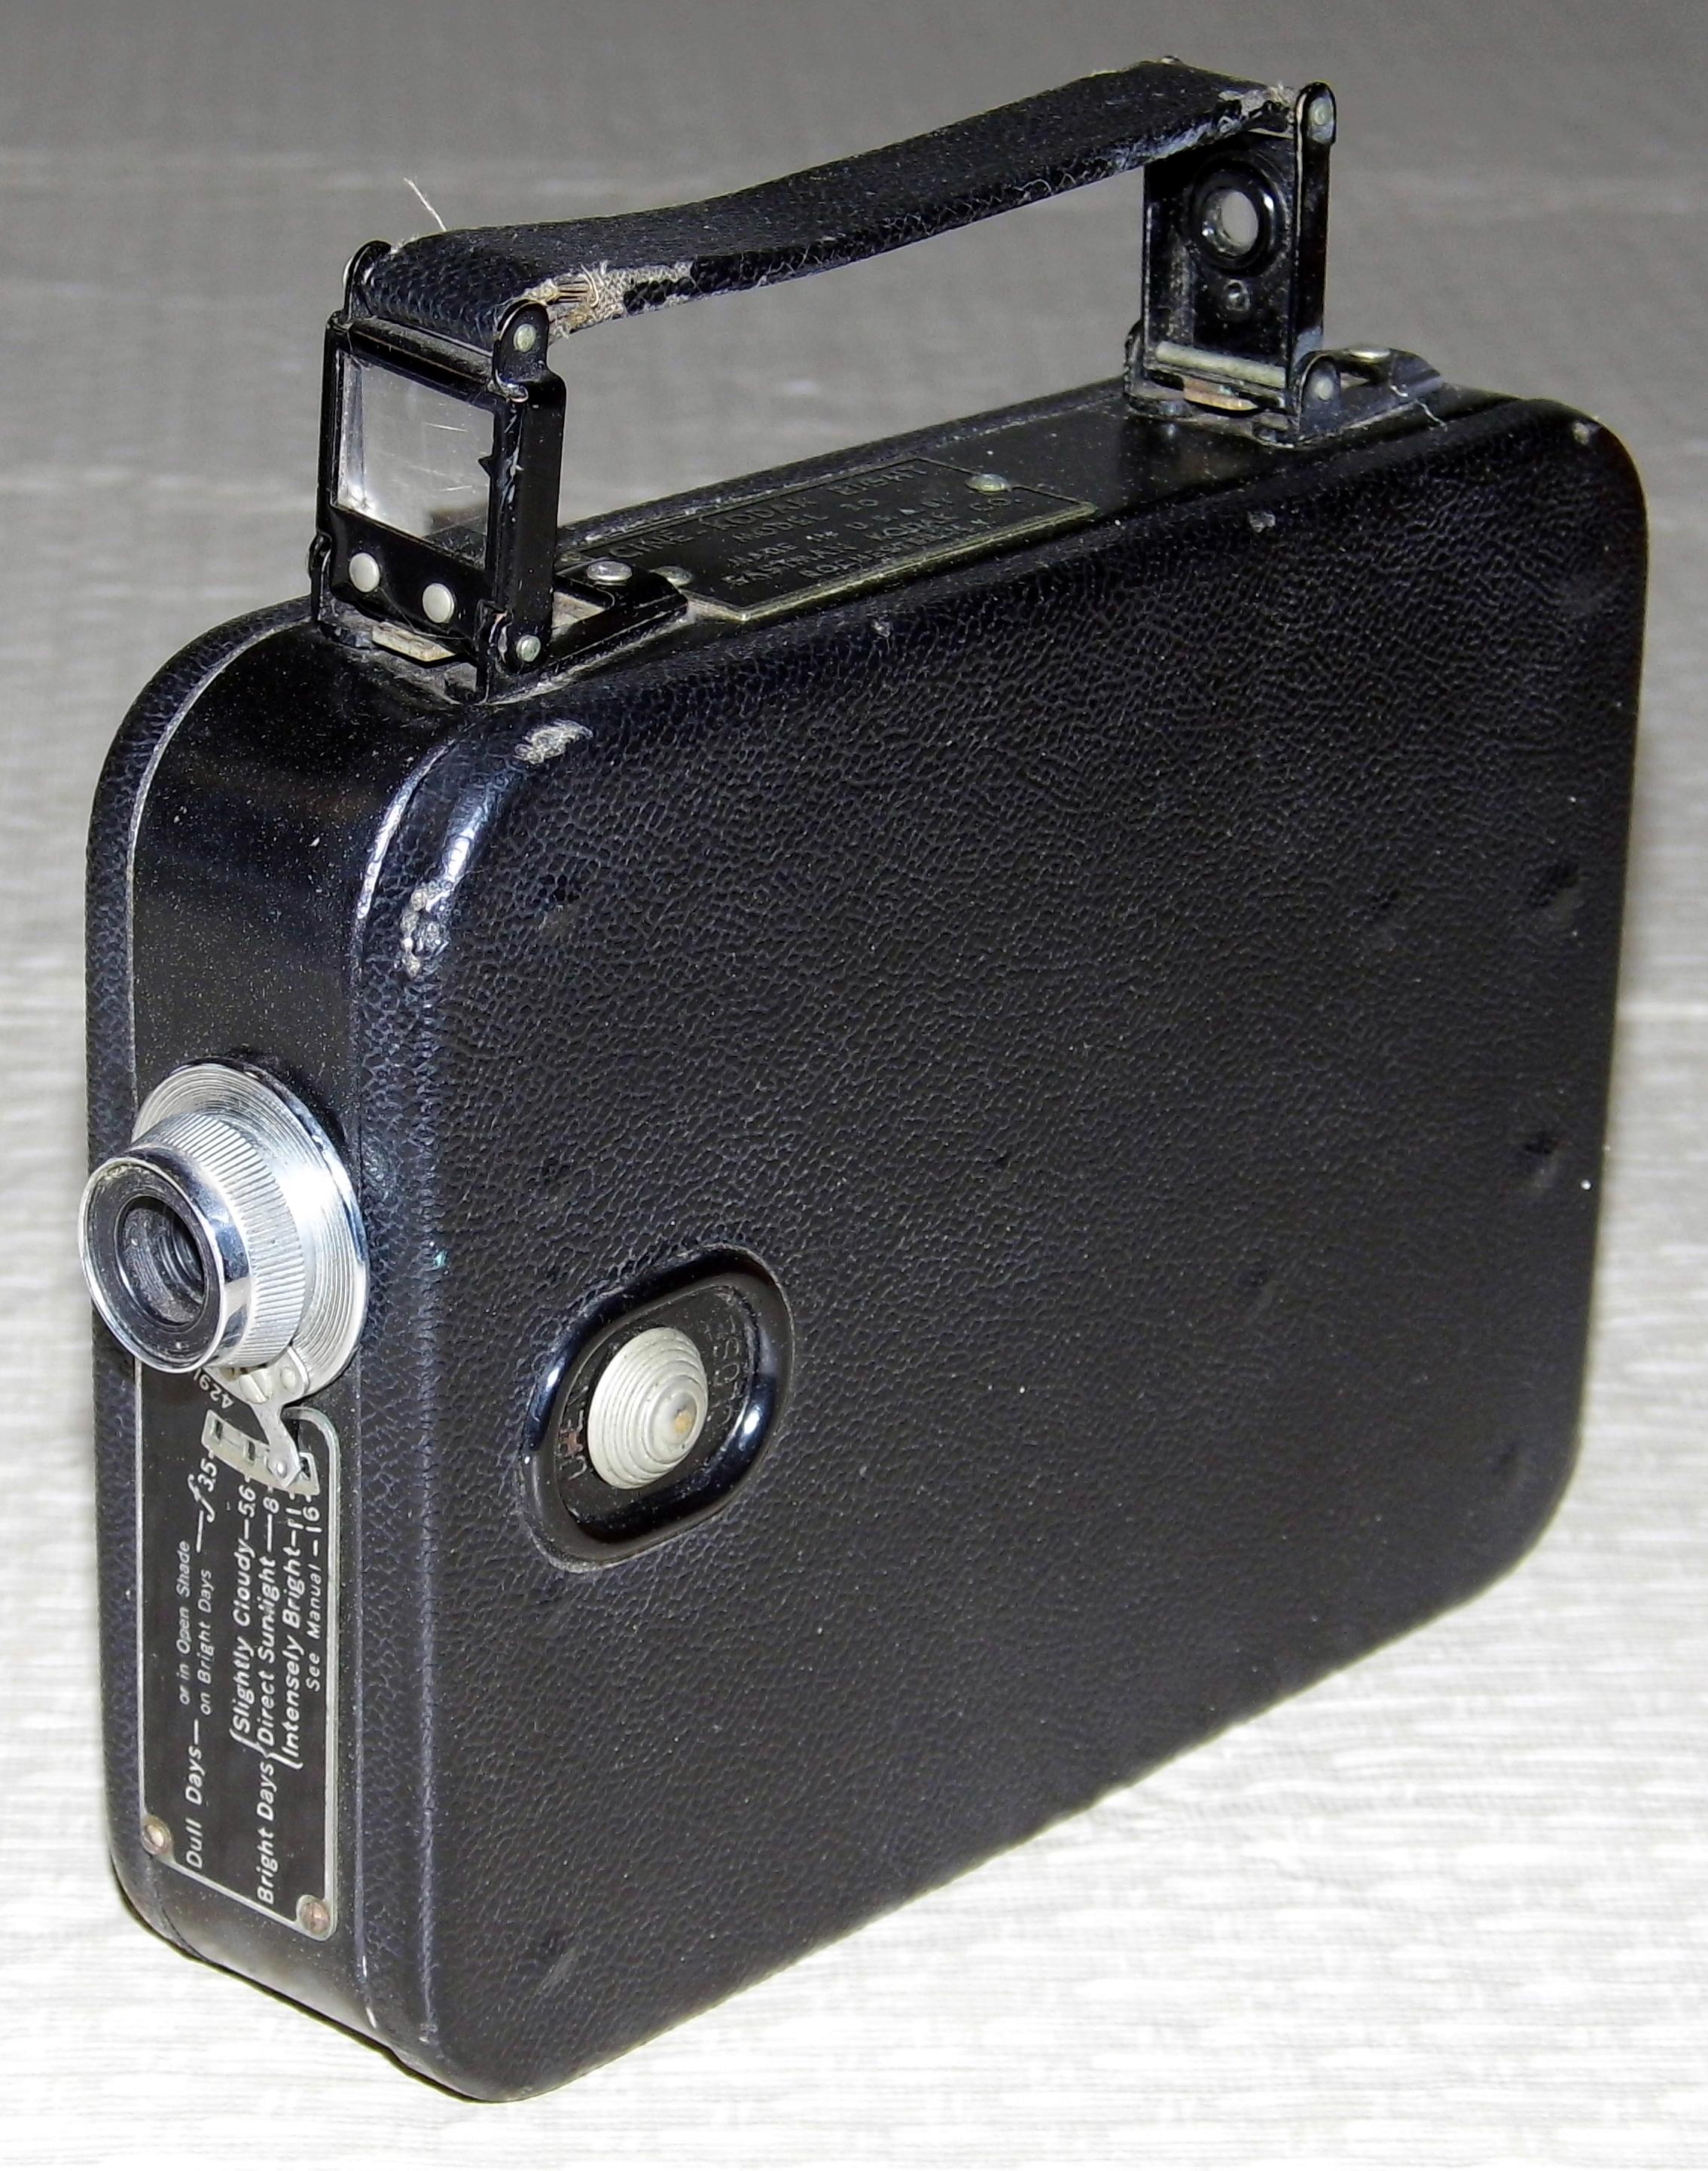 file vintage kodak cine kodak eight model 20 8mm movie camera rh commons wikimedia org 8A Film Model Cine-Kodak Cartgrage Cine-Kodak 16Mm